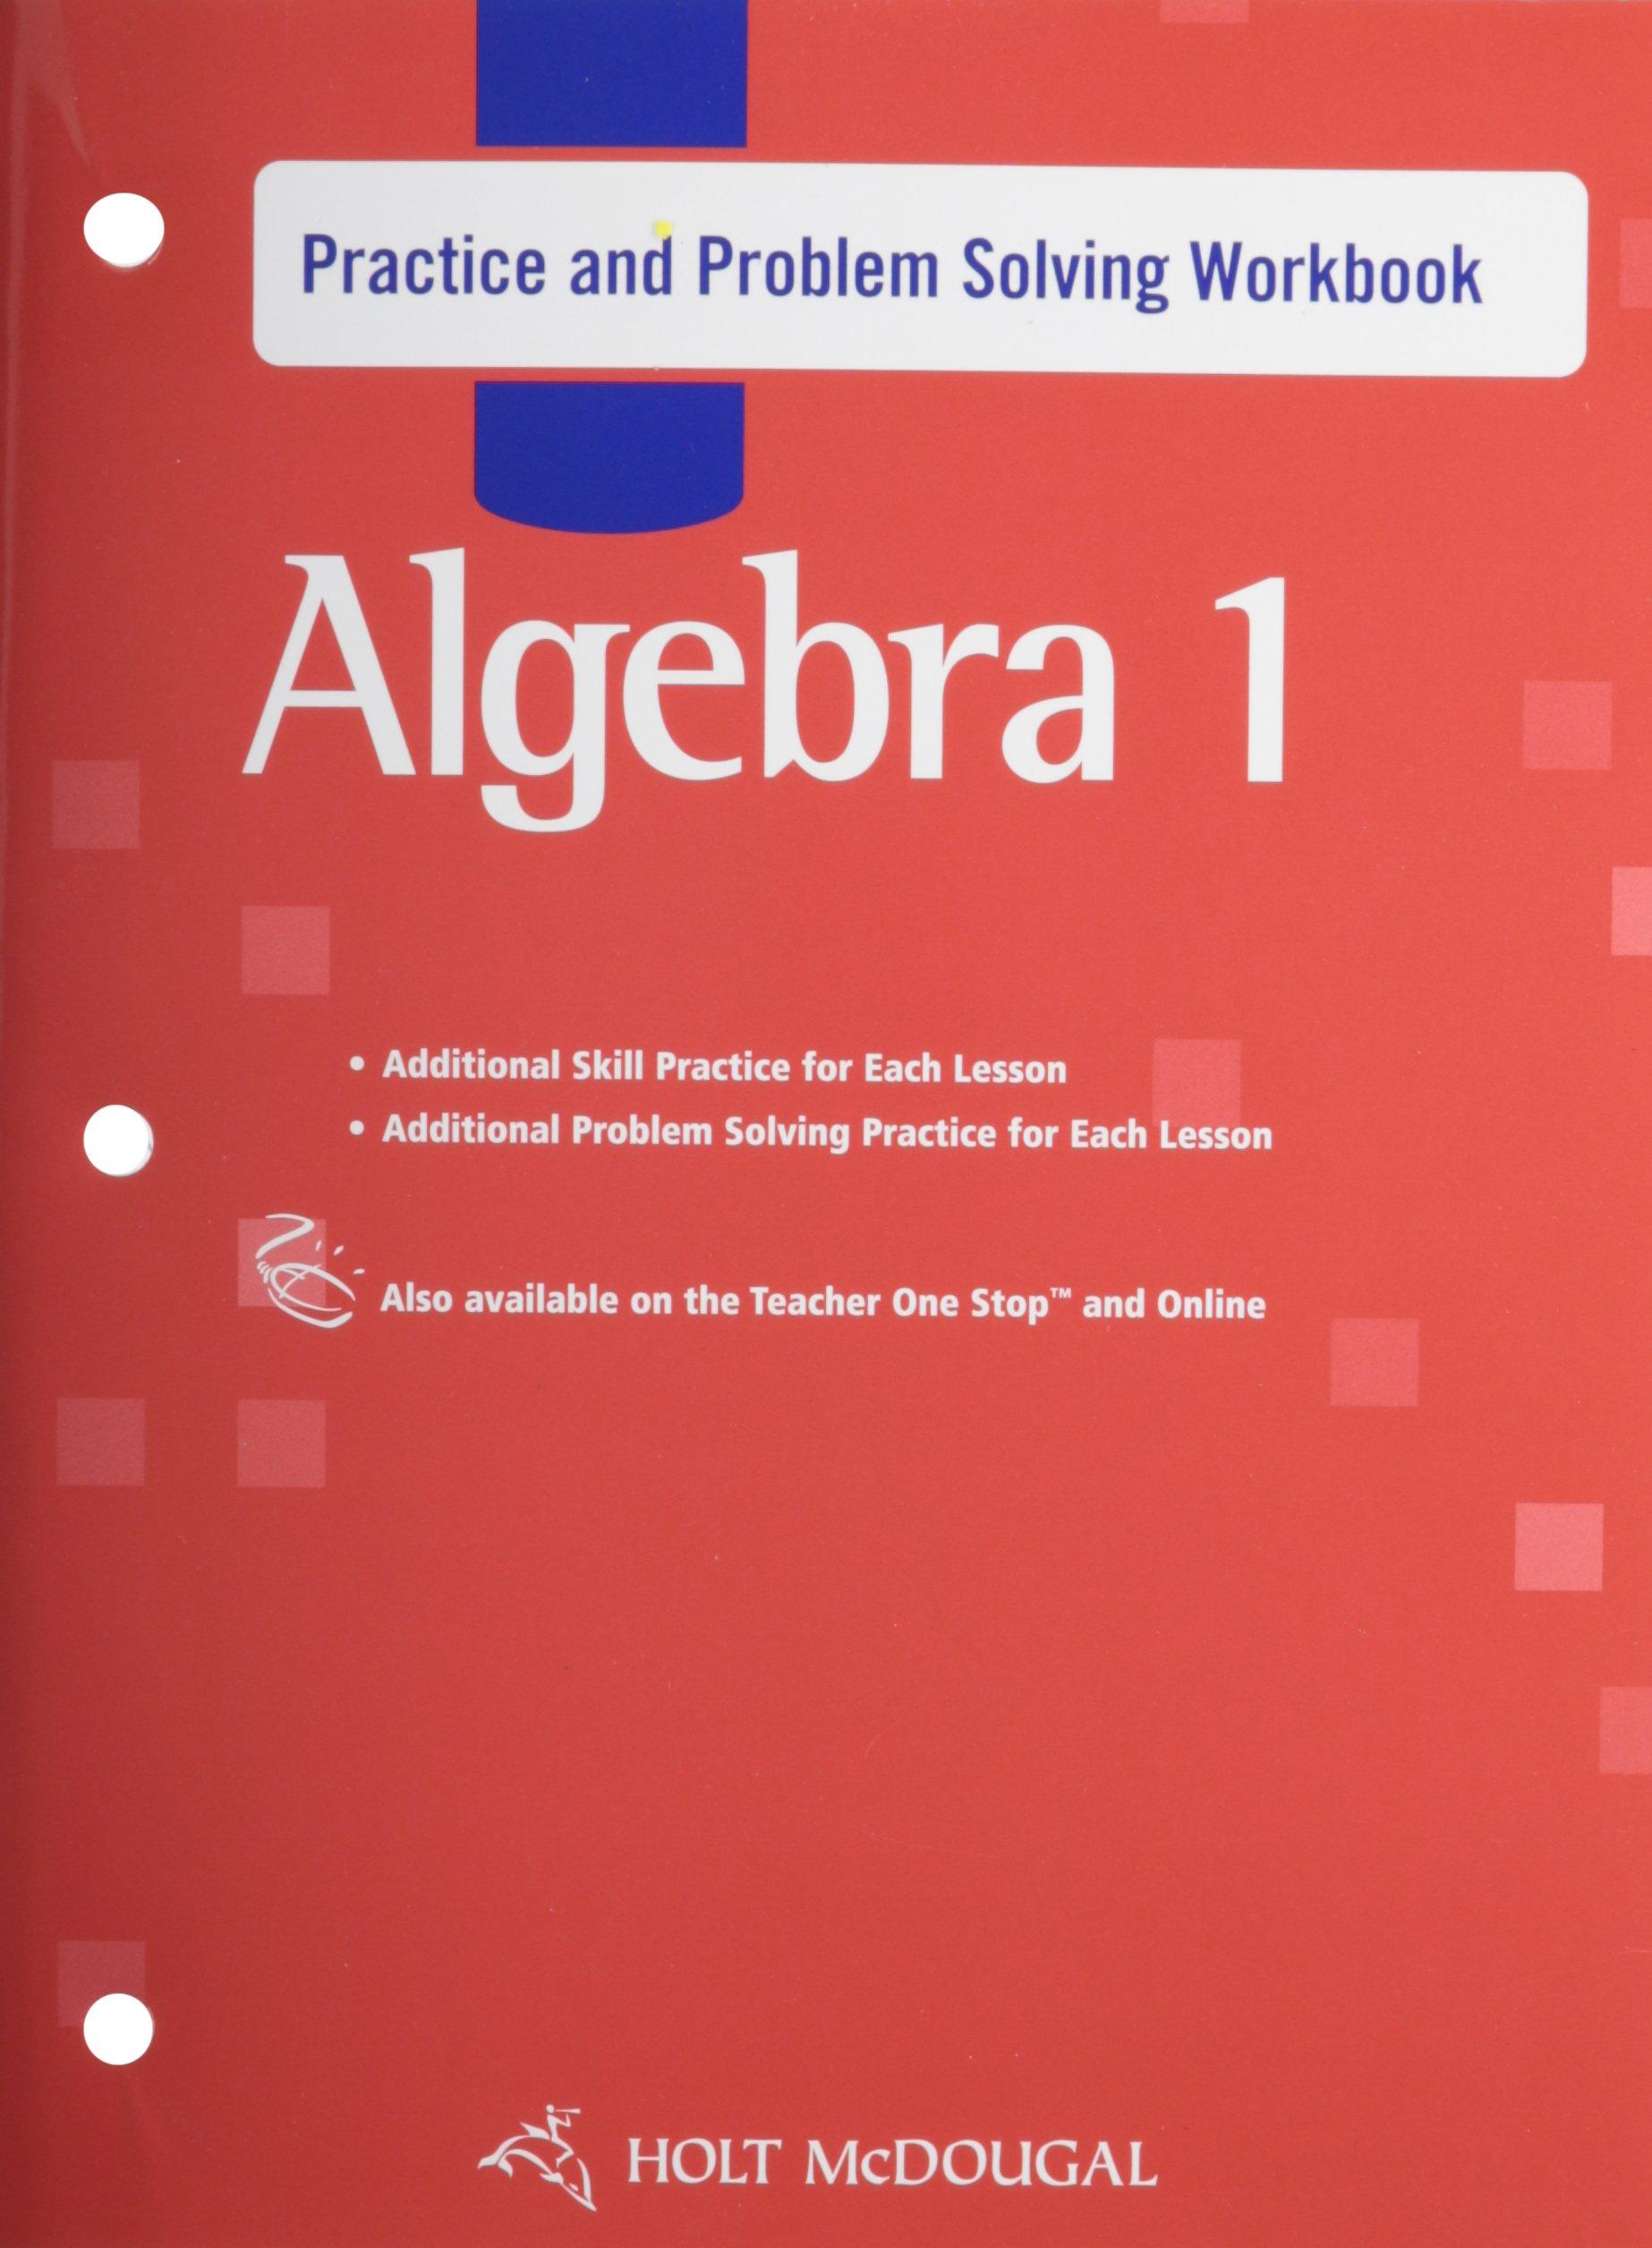 Download Holt McDougal Algebra 1 Practice and Problem Solving Workbook Algebra 1 ebook